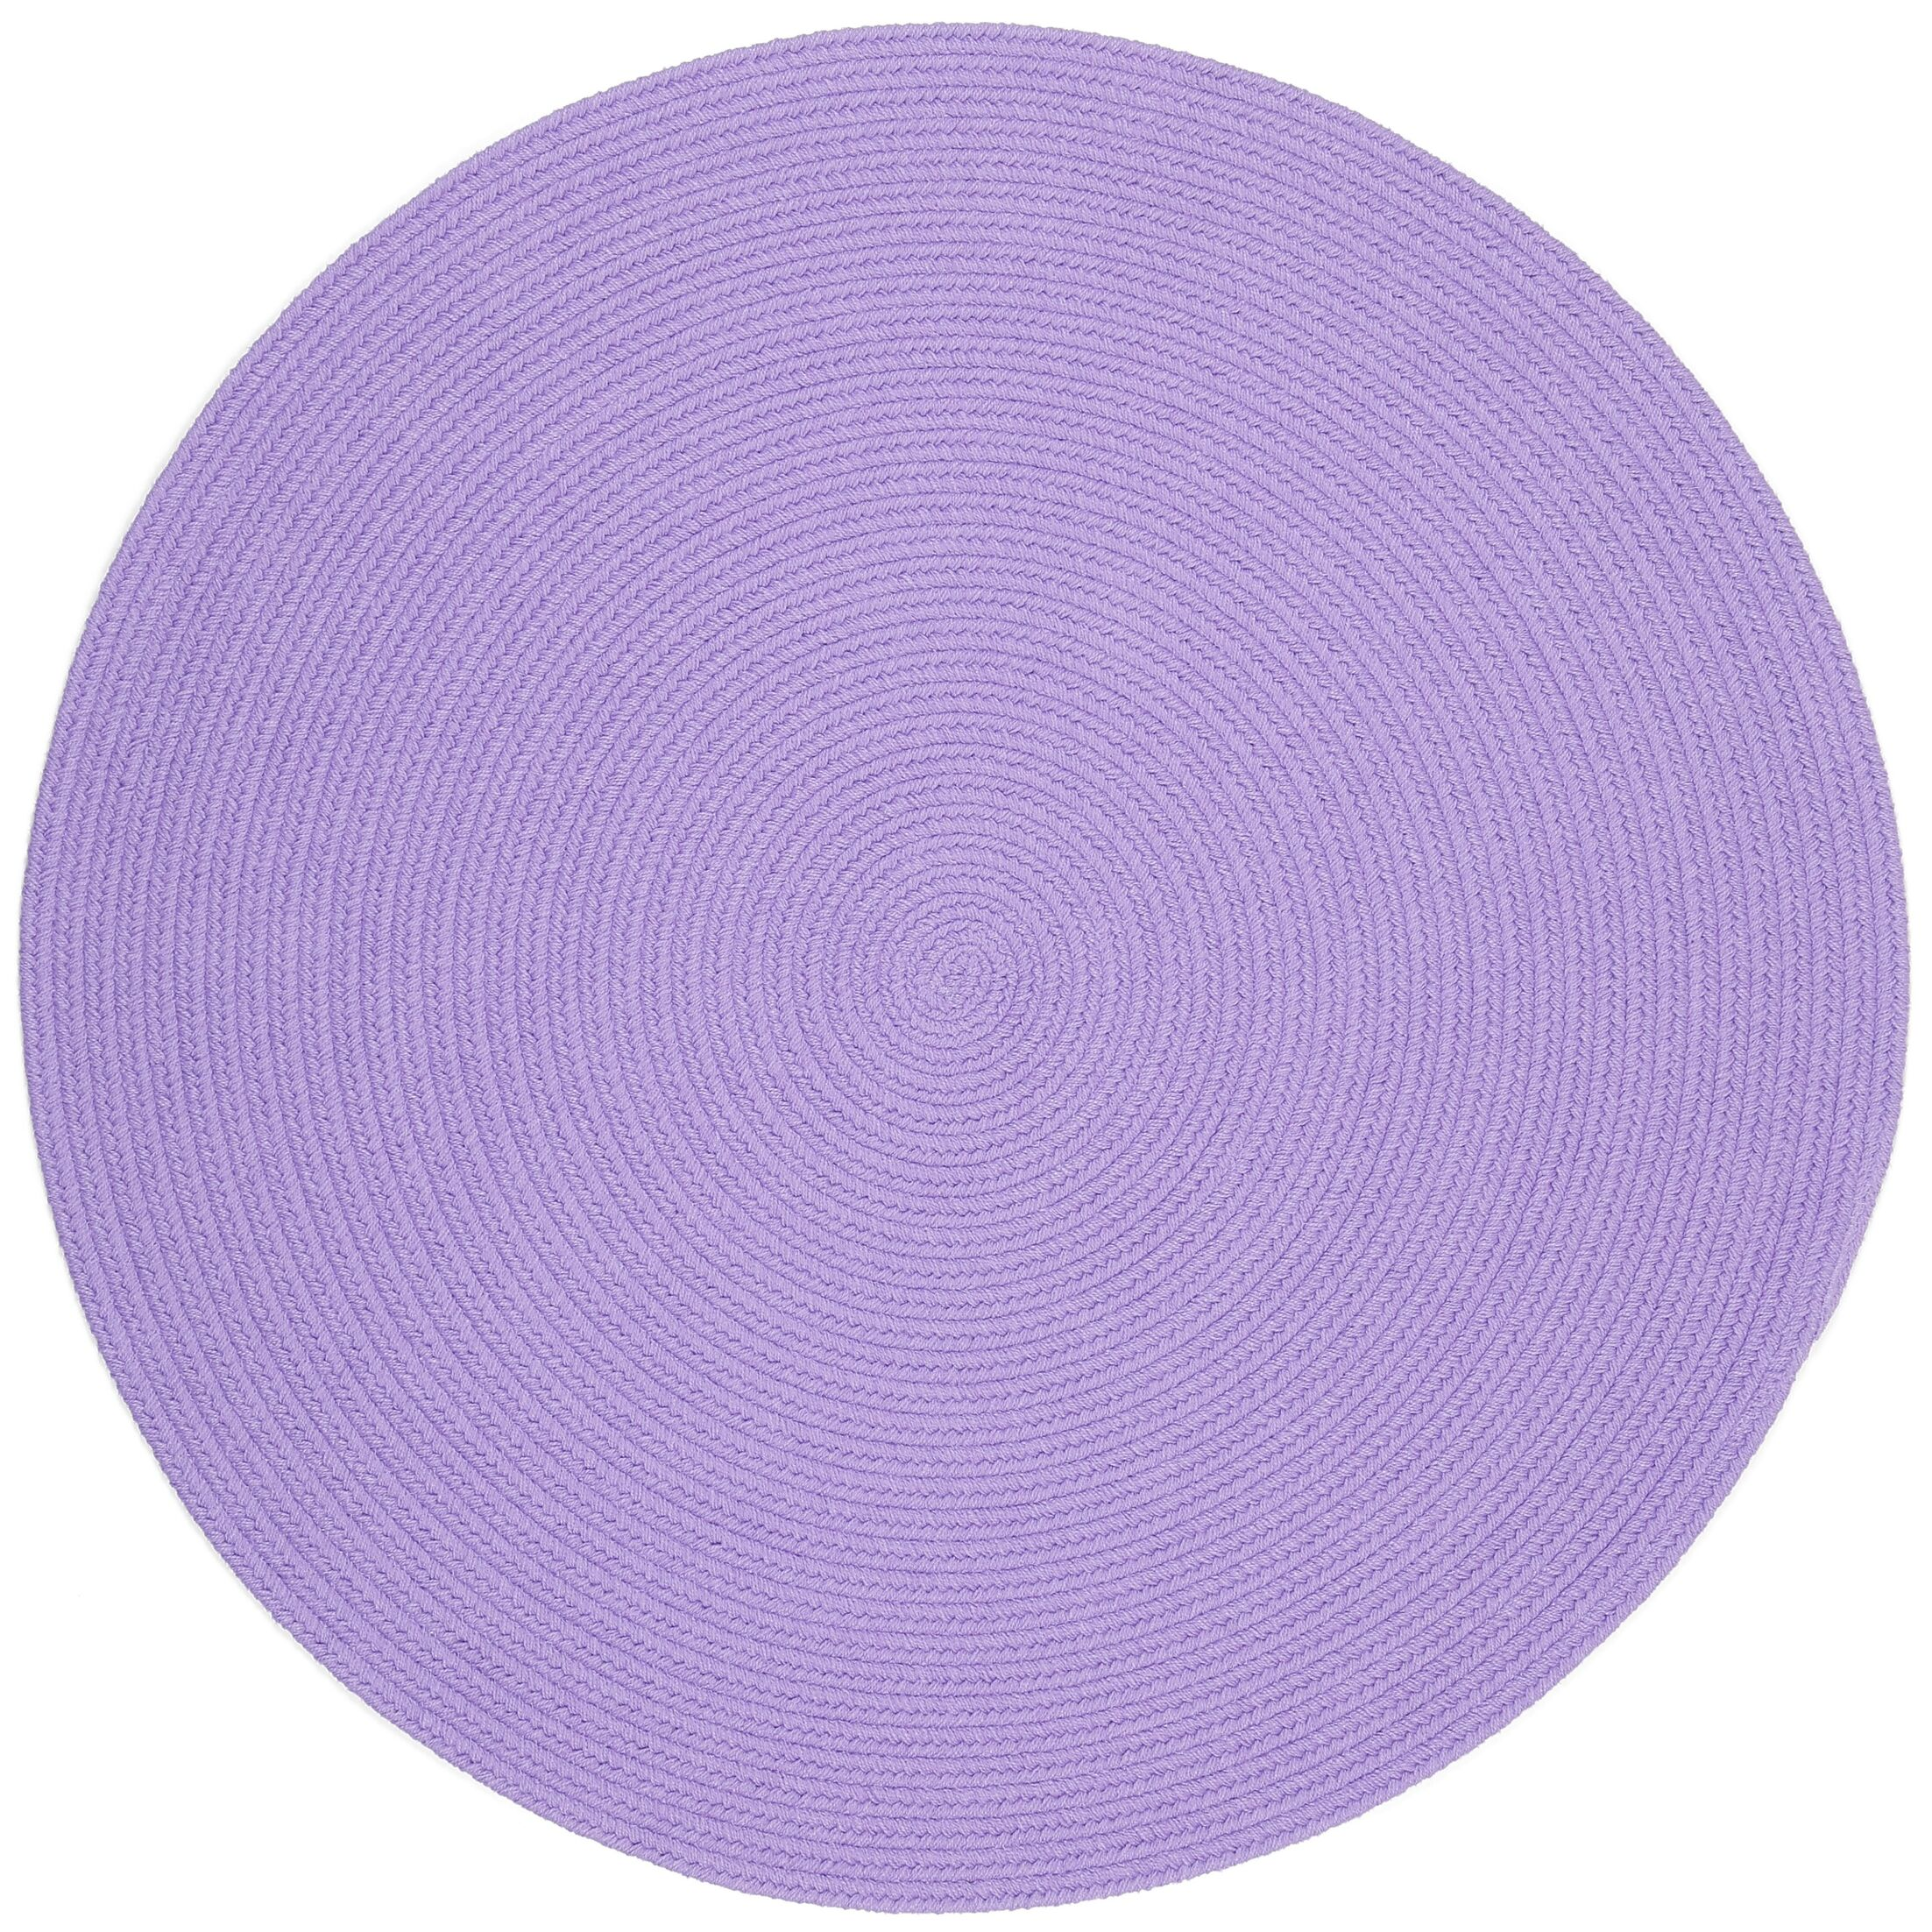 Sainthia Violet Indoor/Outdoor Area Rug Rug Size: Round 8'